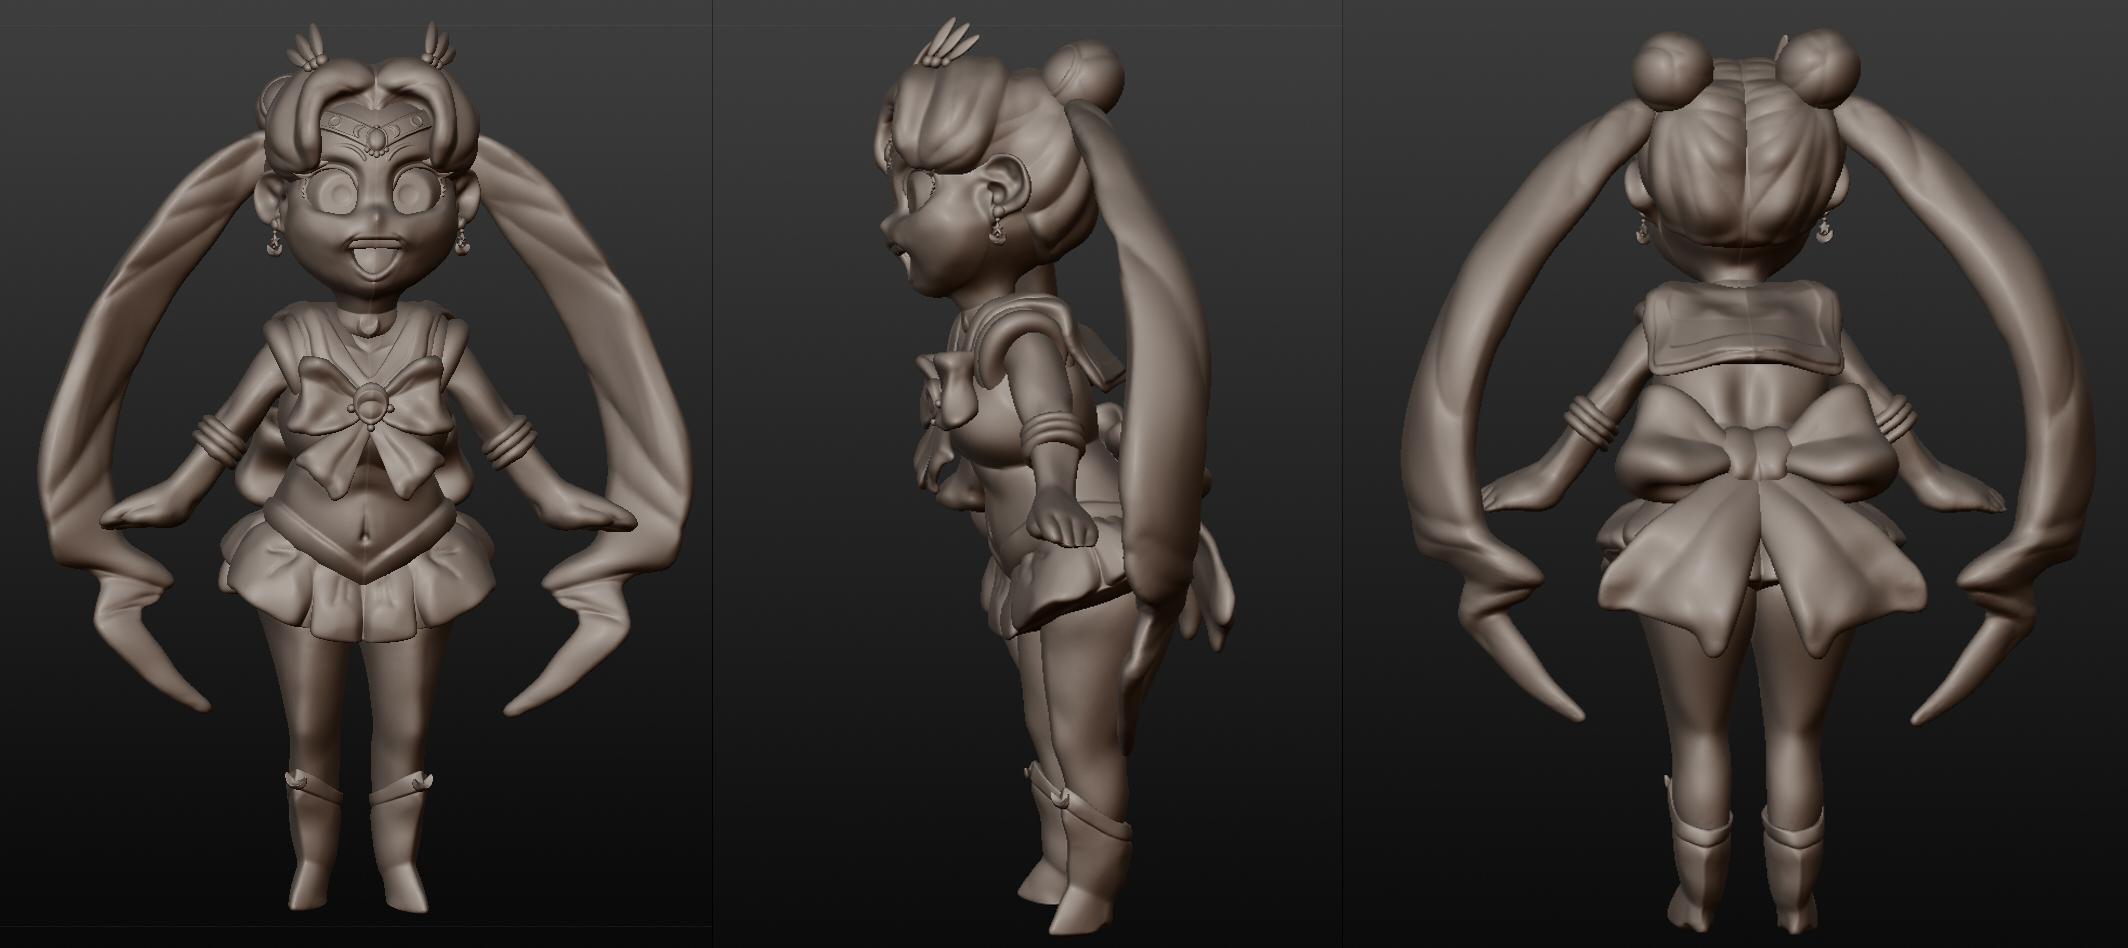 [MMA] Gazzycakes Artwork Sailor_moon_by_gazzycakes-d62jw9s